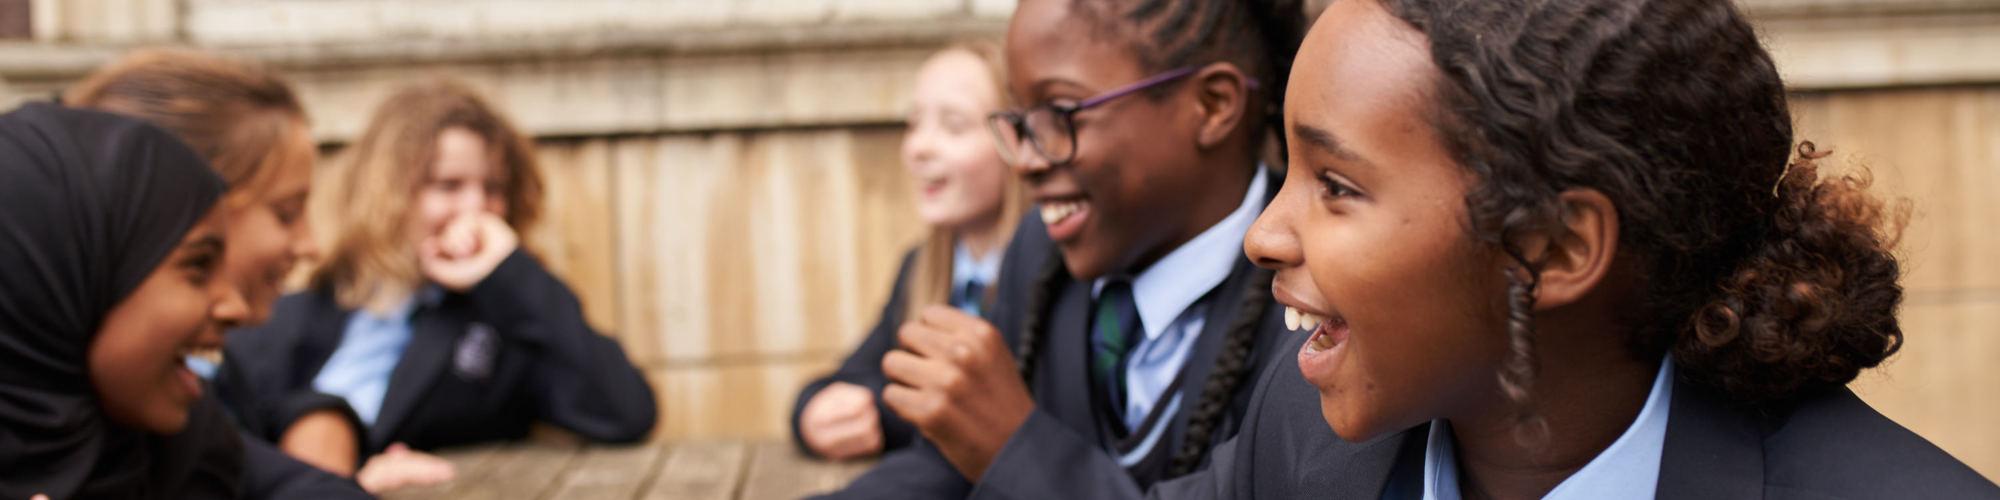 20 09 24.Chiswick School.2030